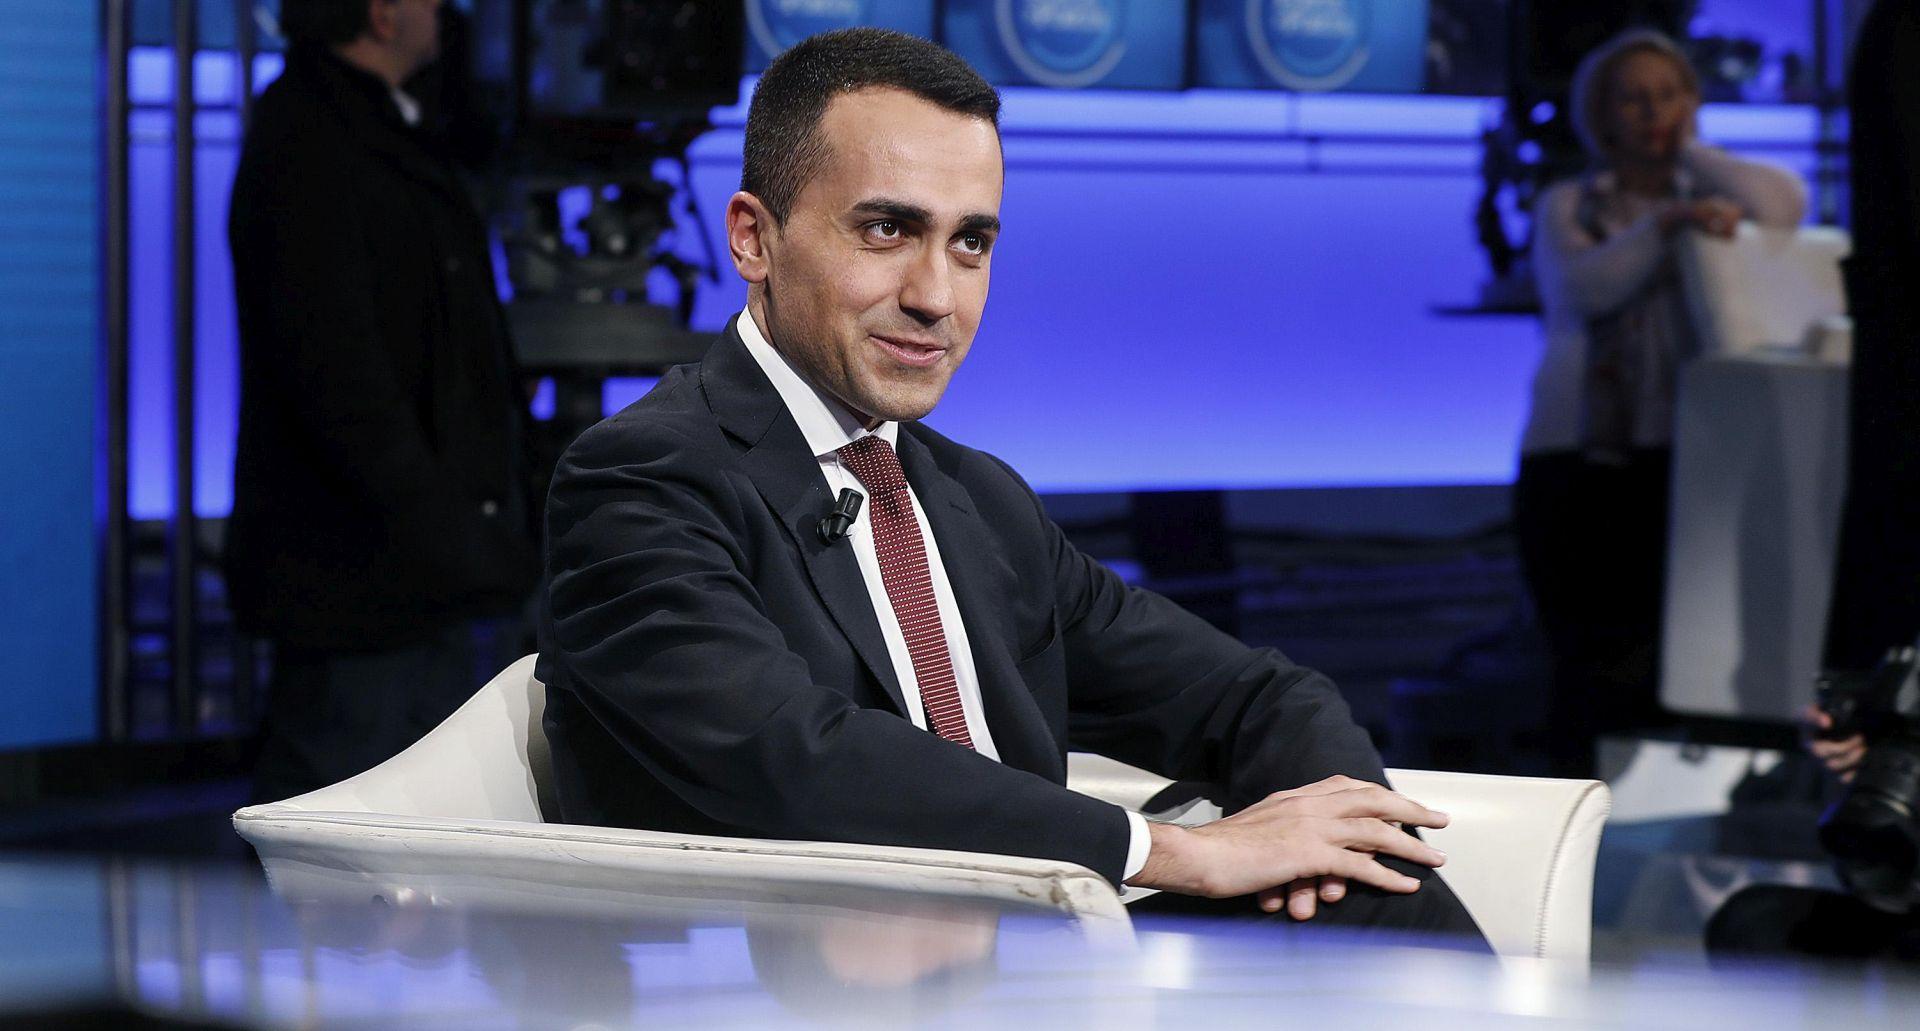 Italija: vladajuća koalicija u svađi zbog Ursule von der Leyen